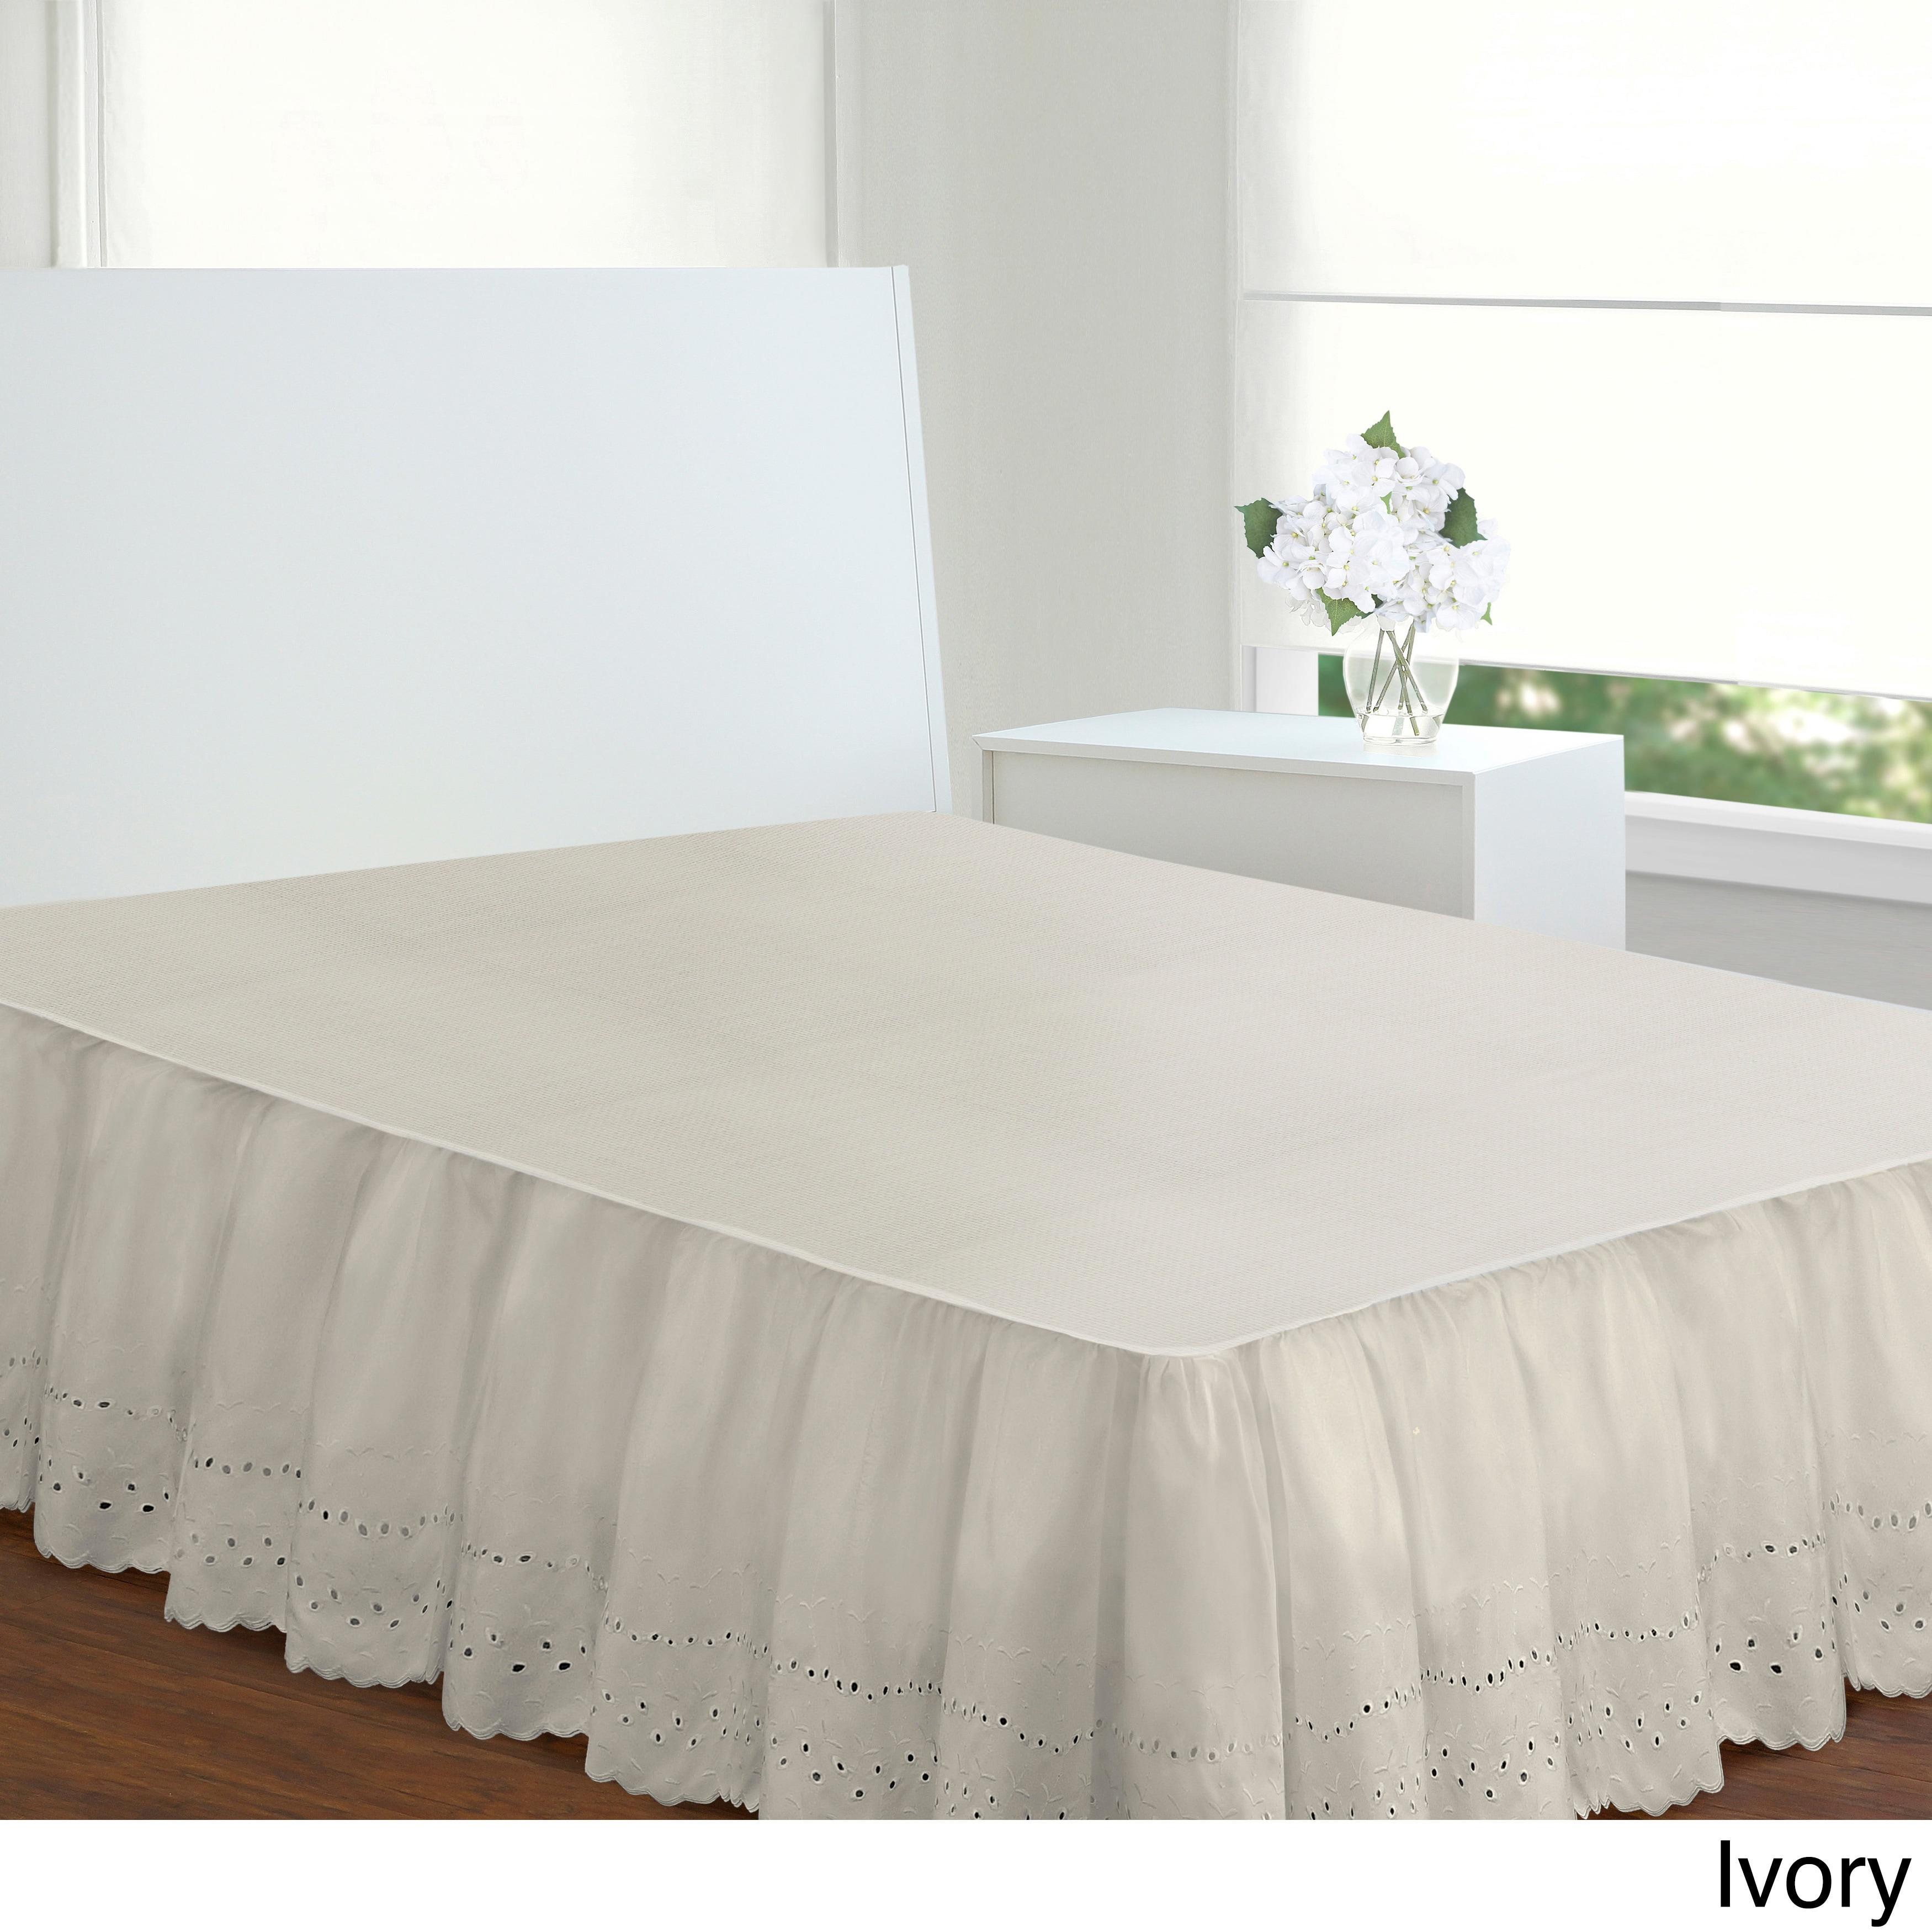 Fresh Ideas Lauren Heirloom Ruffled Eyelet 14 Inch Drop Bedskirt On Free Shipping Orders Over 45 3444058